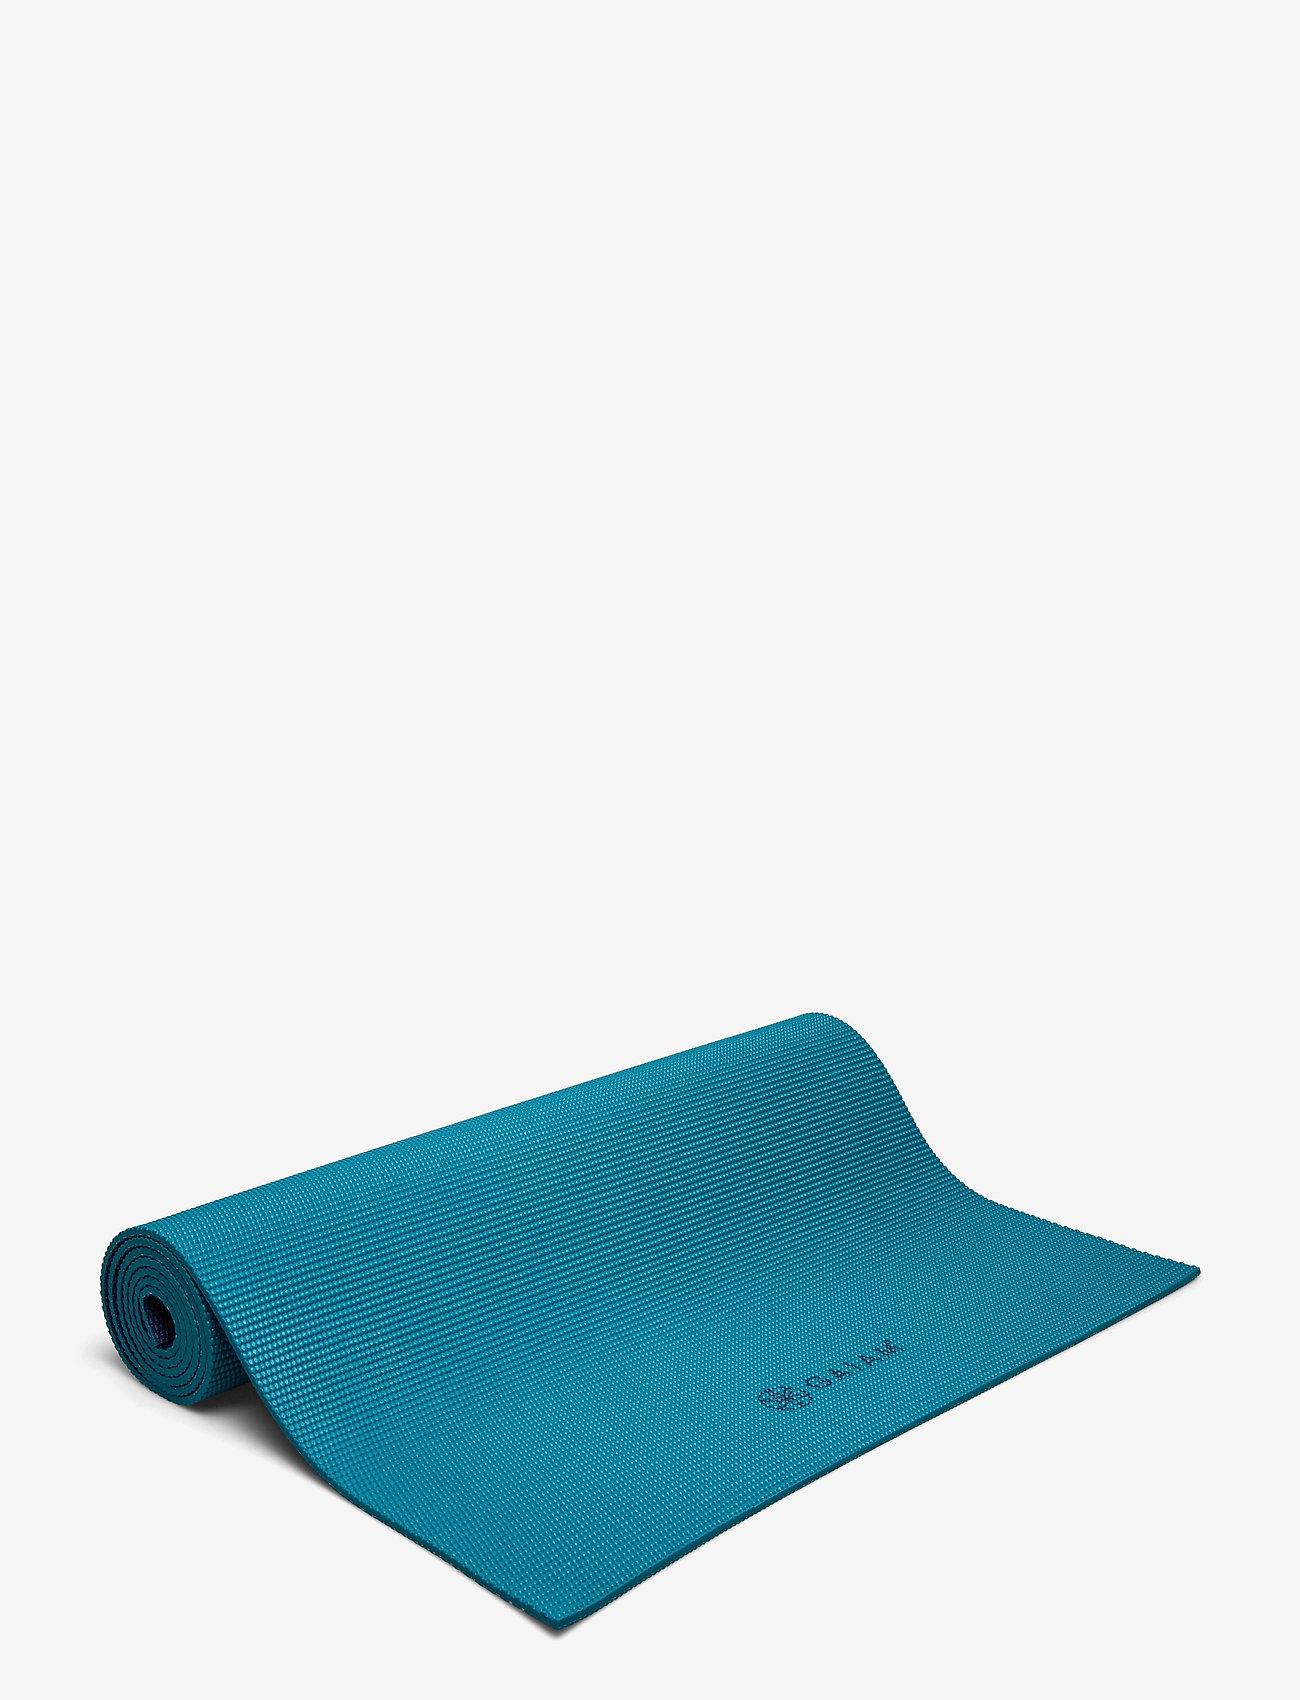 Gaiam - 6mm Yoga Mat 2-Color Navy/Blue - yogamatten & uitrusting - navy/blue - 0